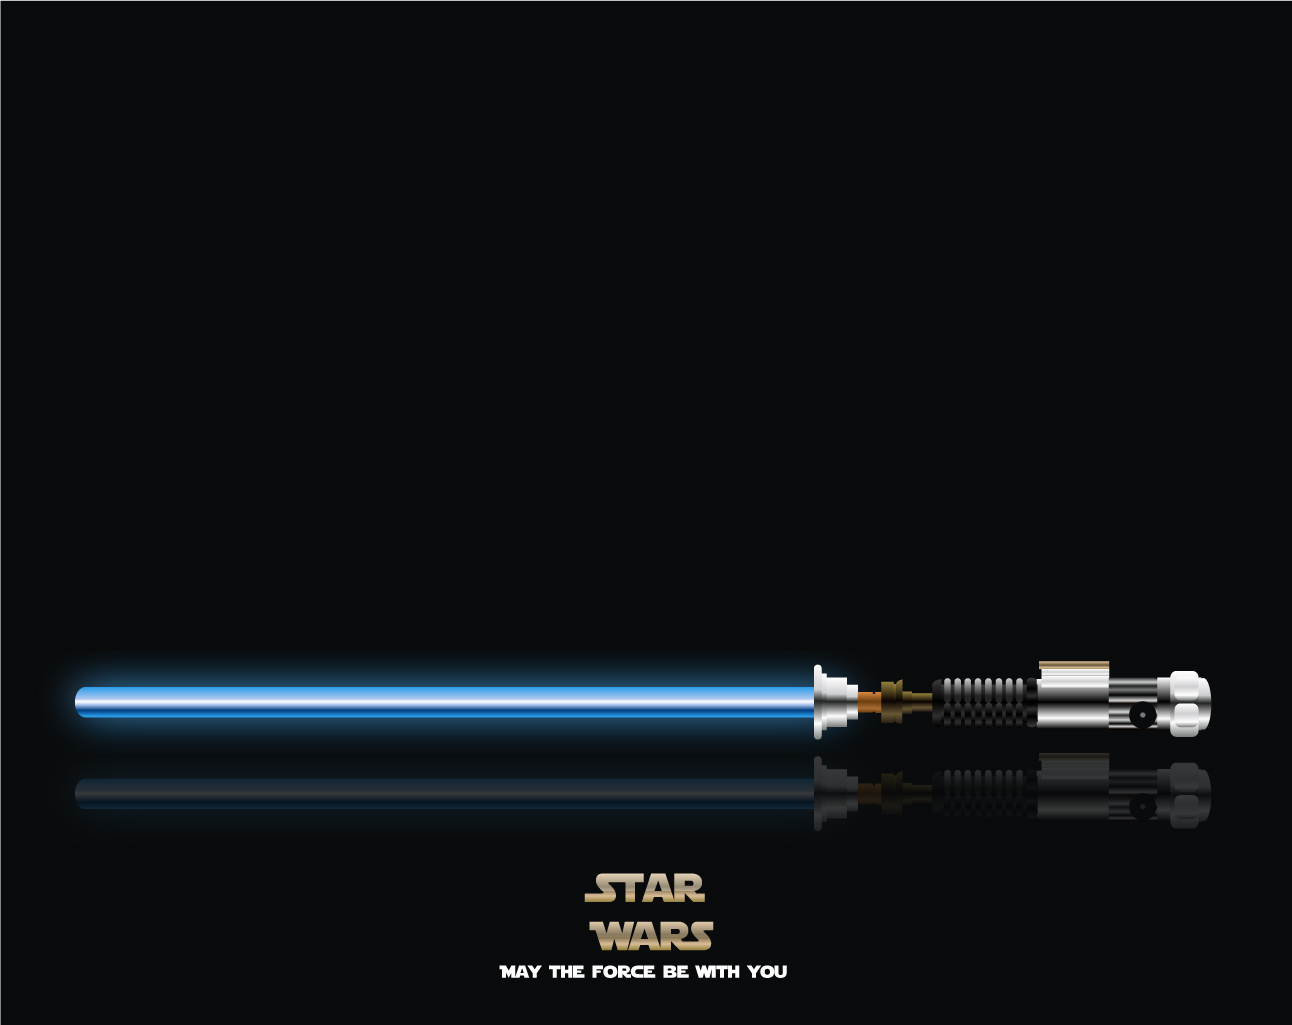 star wars lightsabers HD Wallpaper of Movies TV 1292x1025